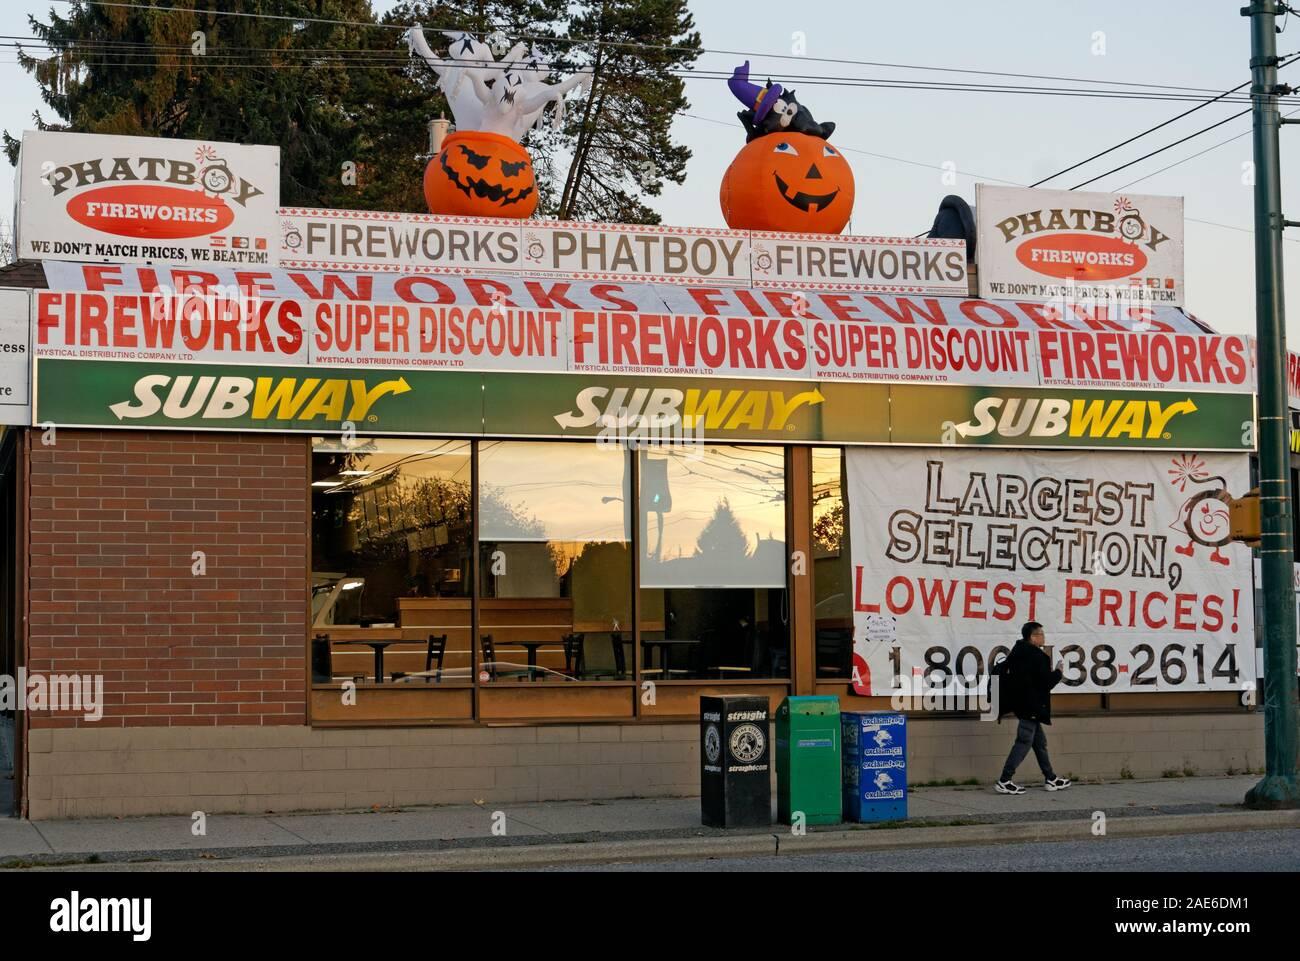 phatboy-halloween-fireworks-store-in-van